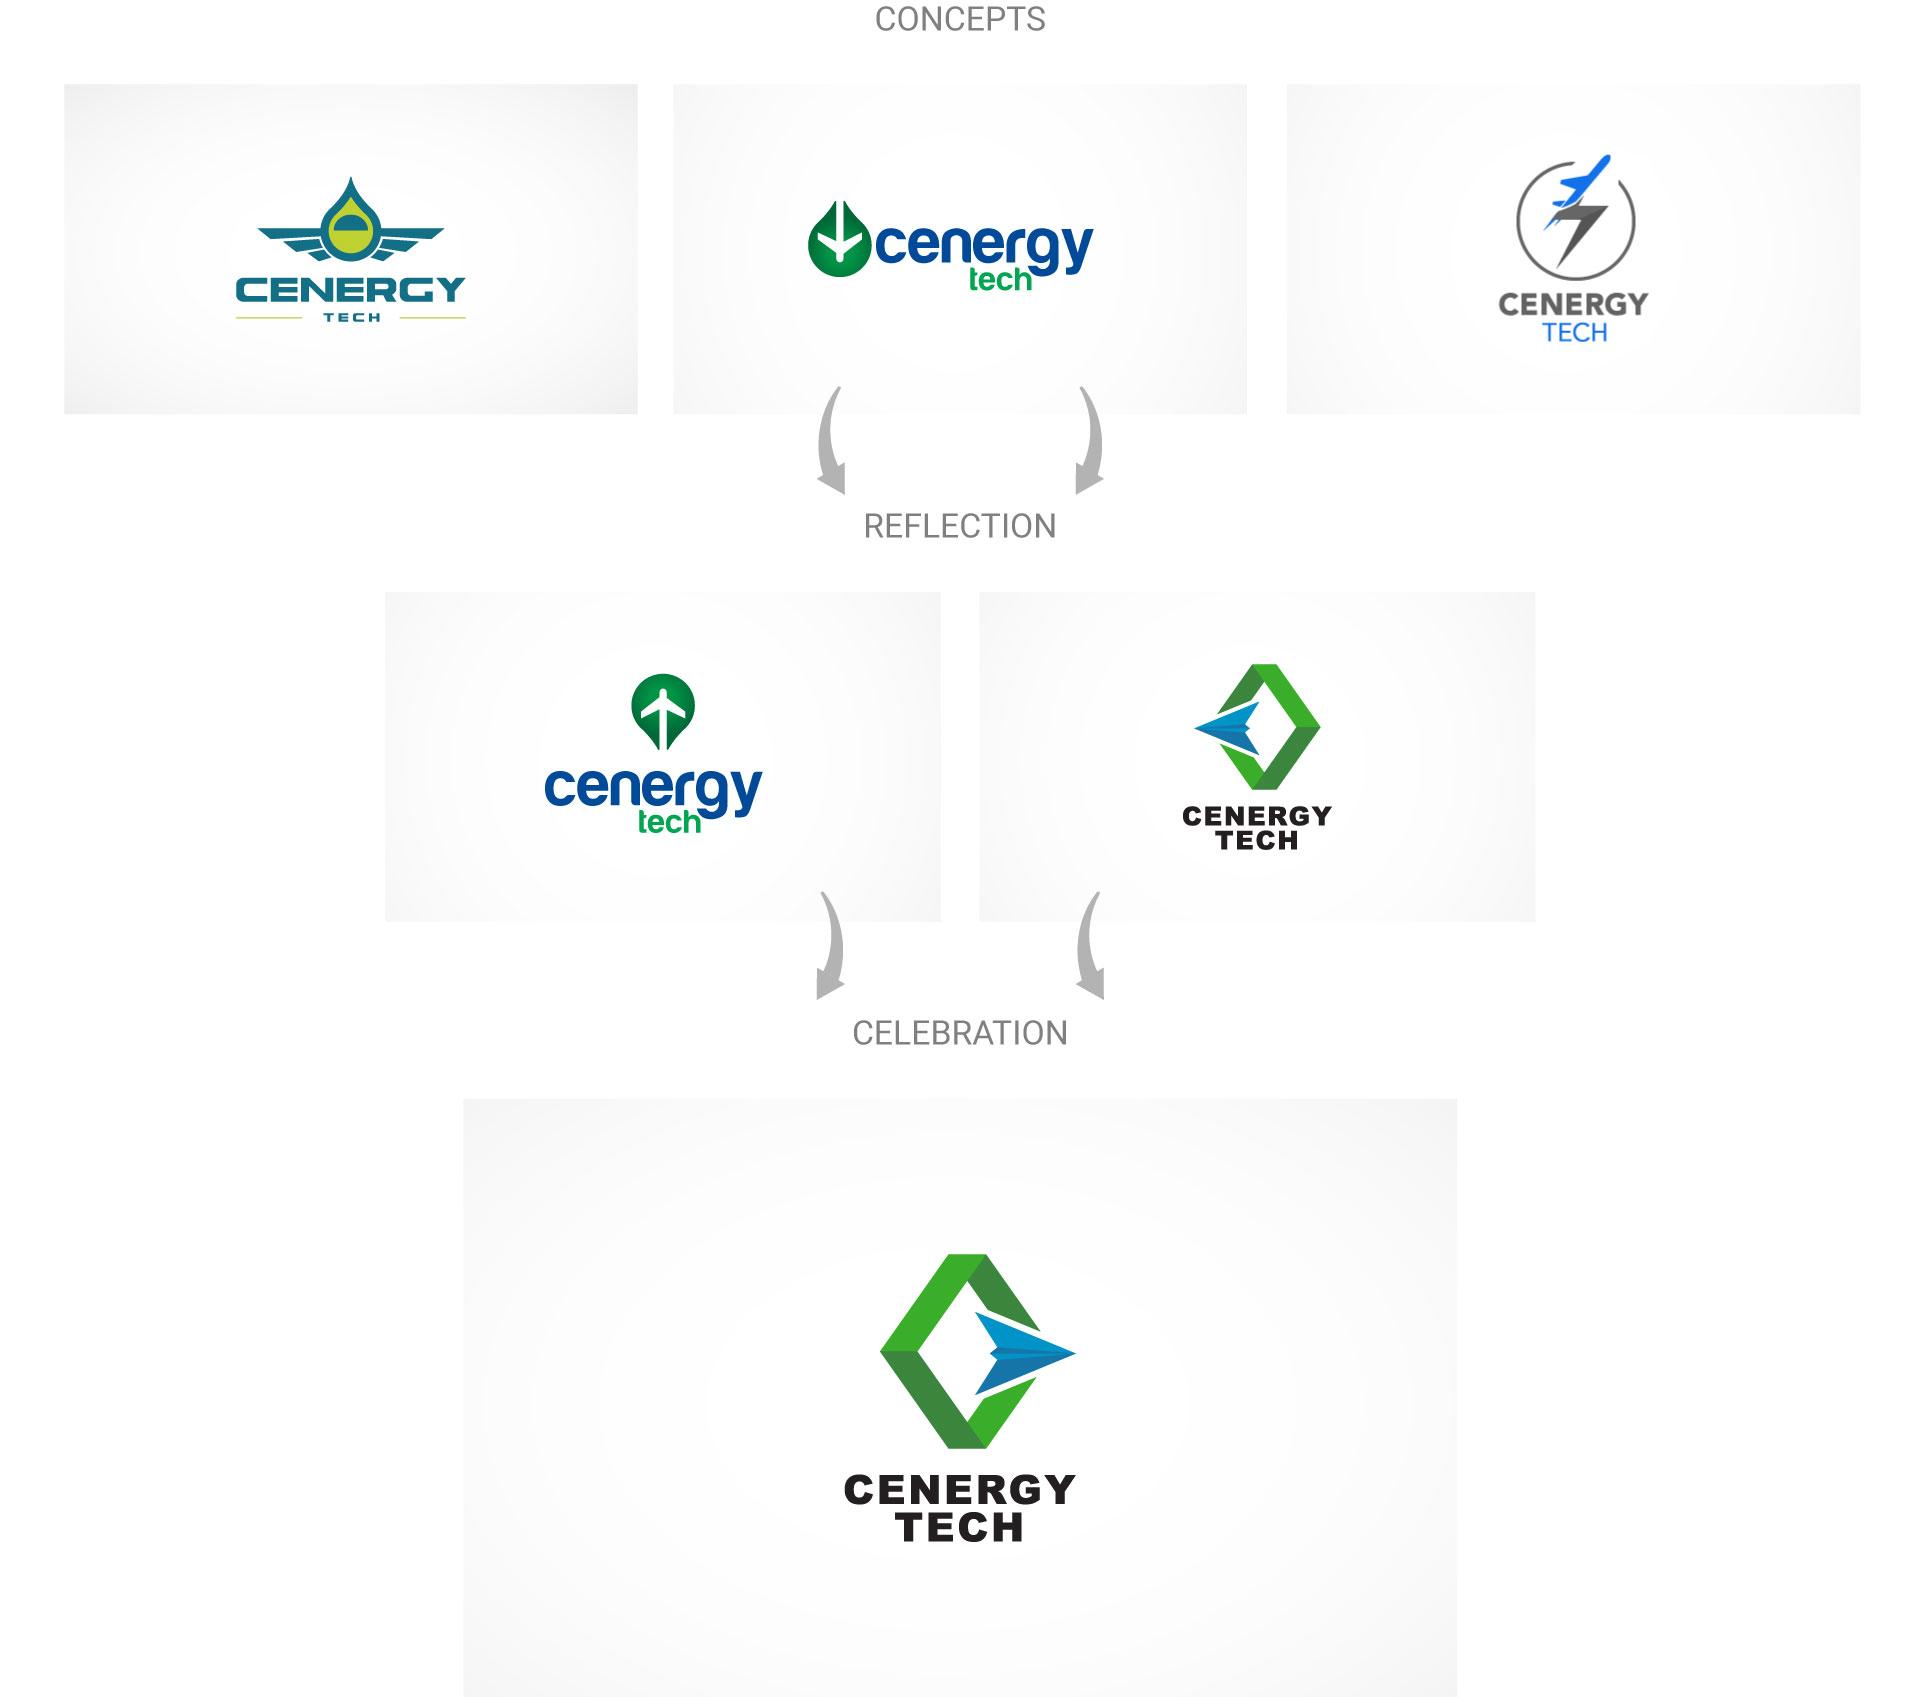 cenergy-tech-logo-design-process-by-mapleweb-vancouver-canada